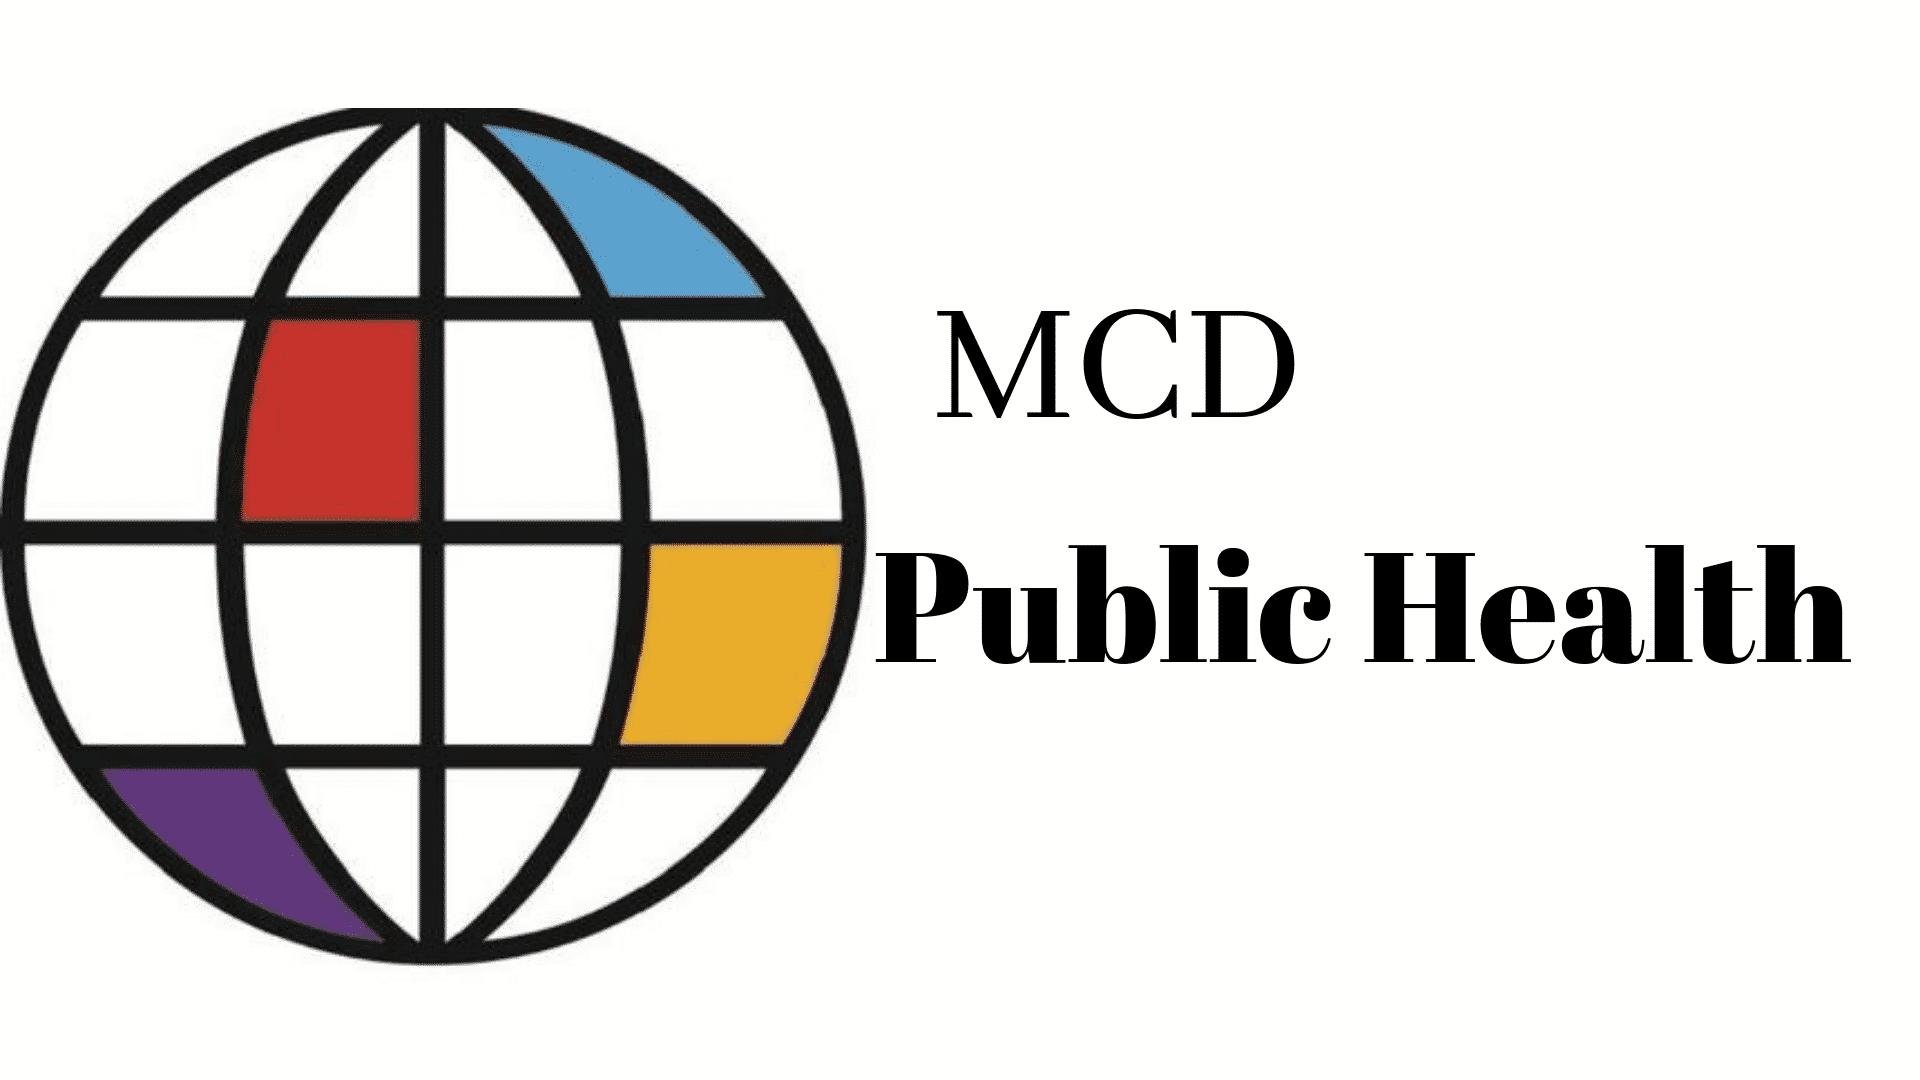 MCD Public Health